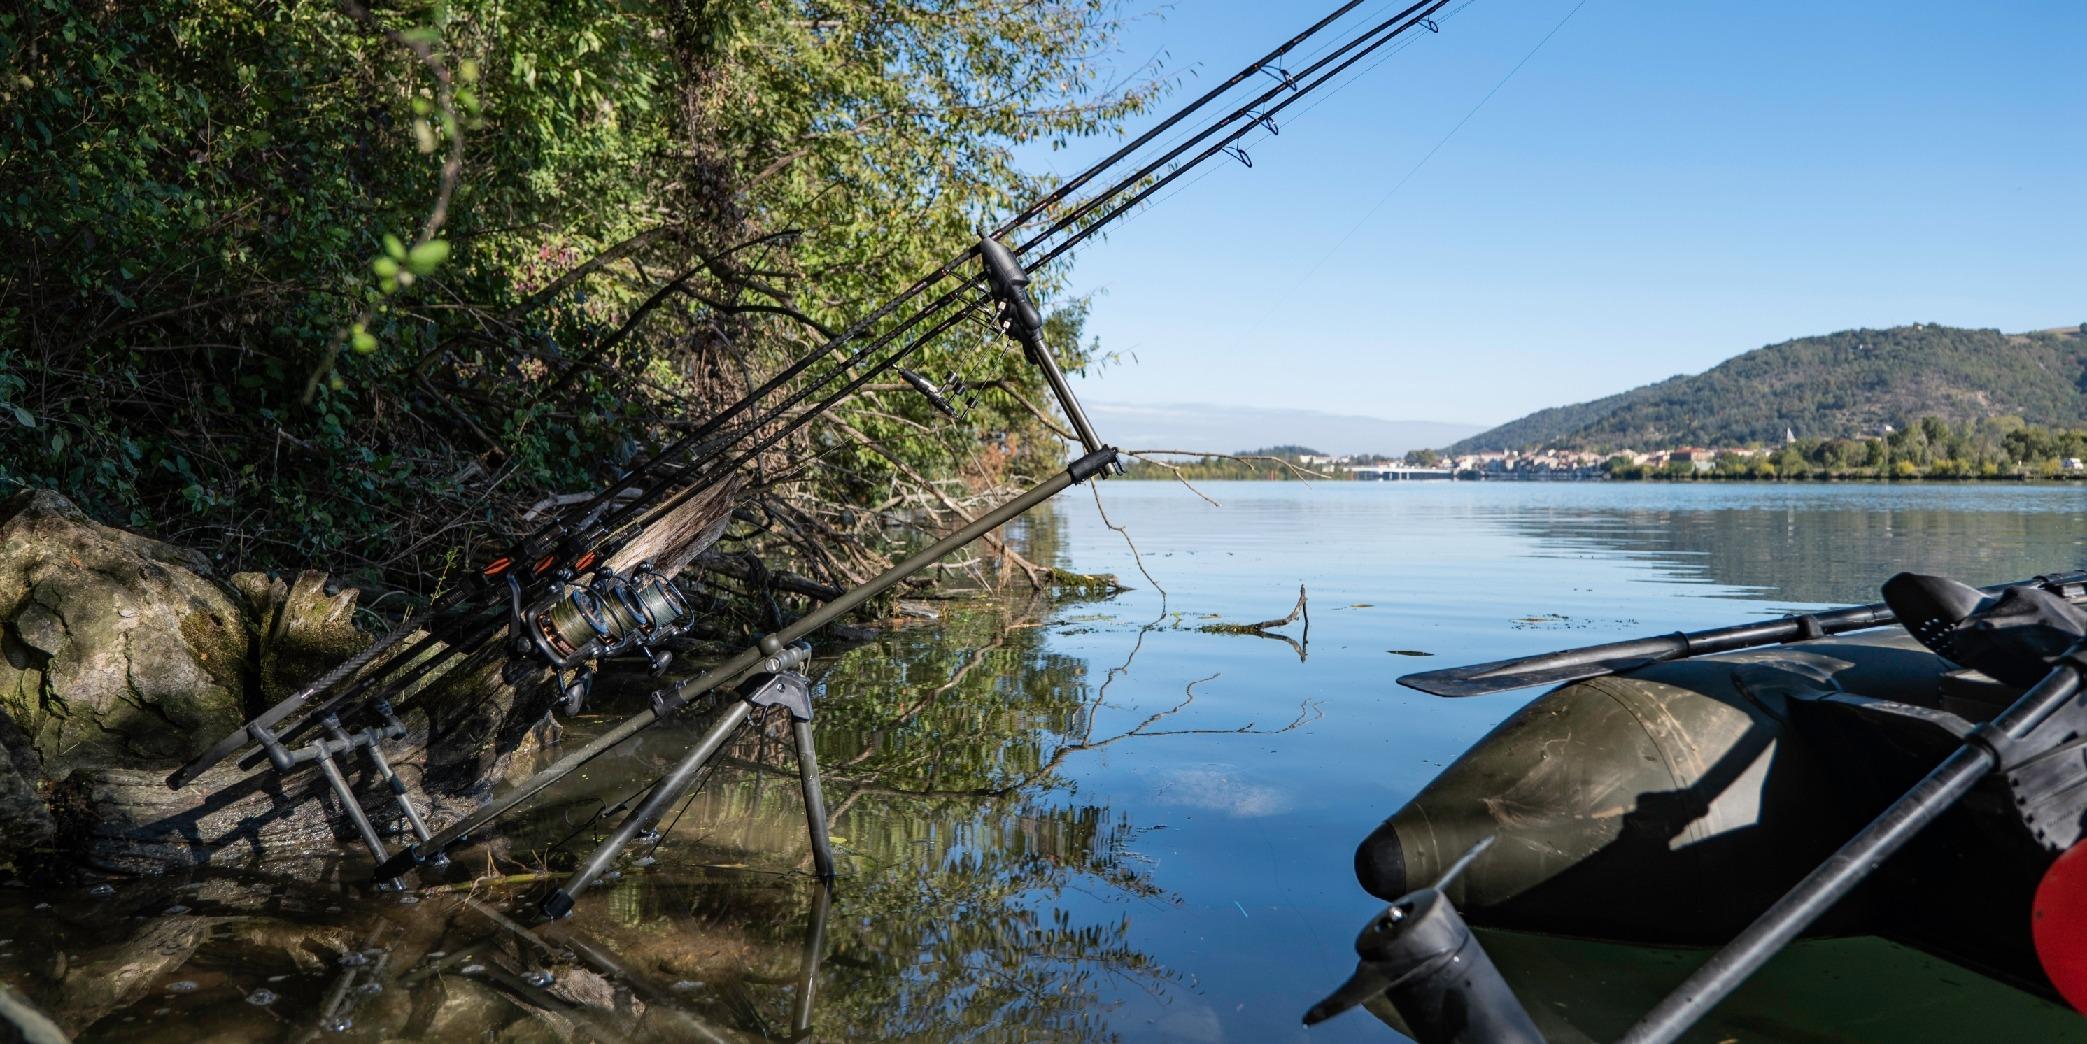 Where To Go Carp Fishing As A Beginner